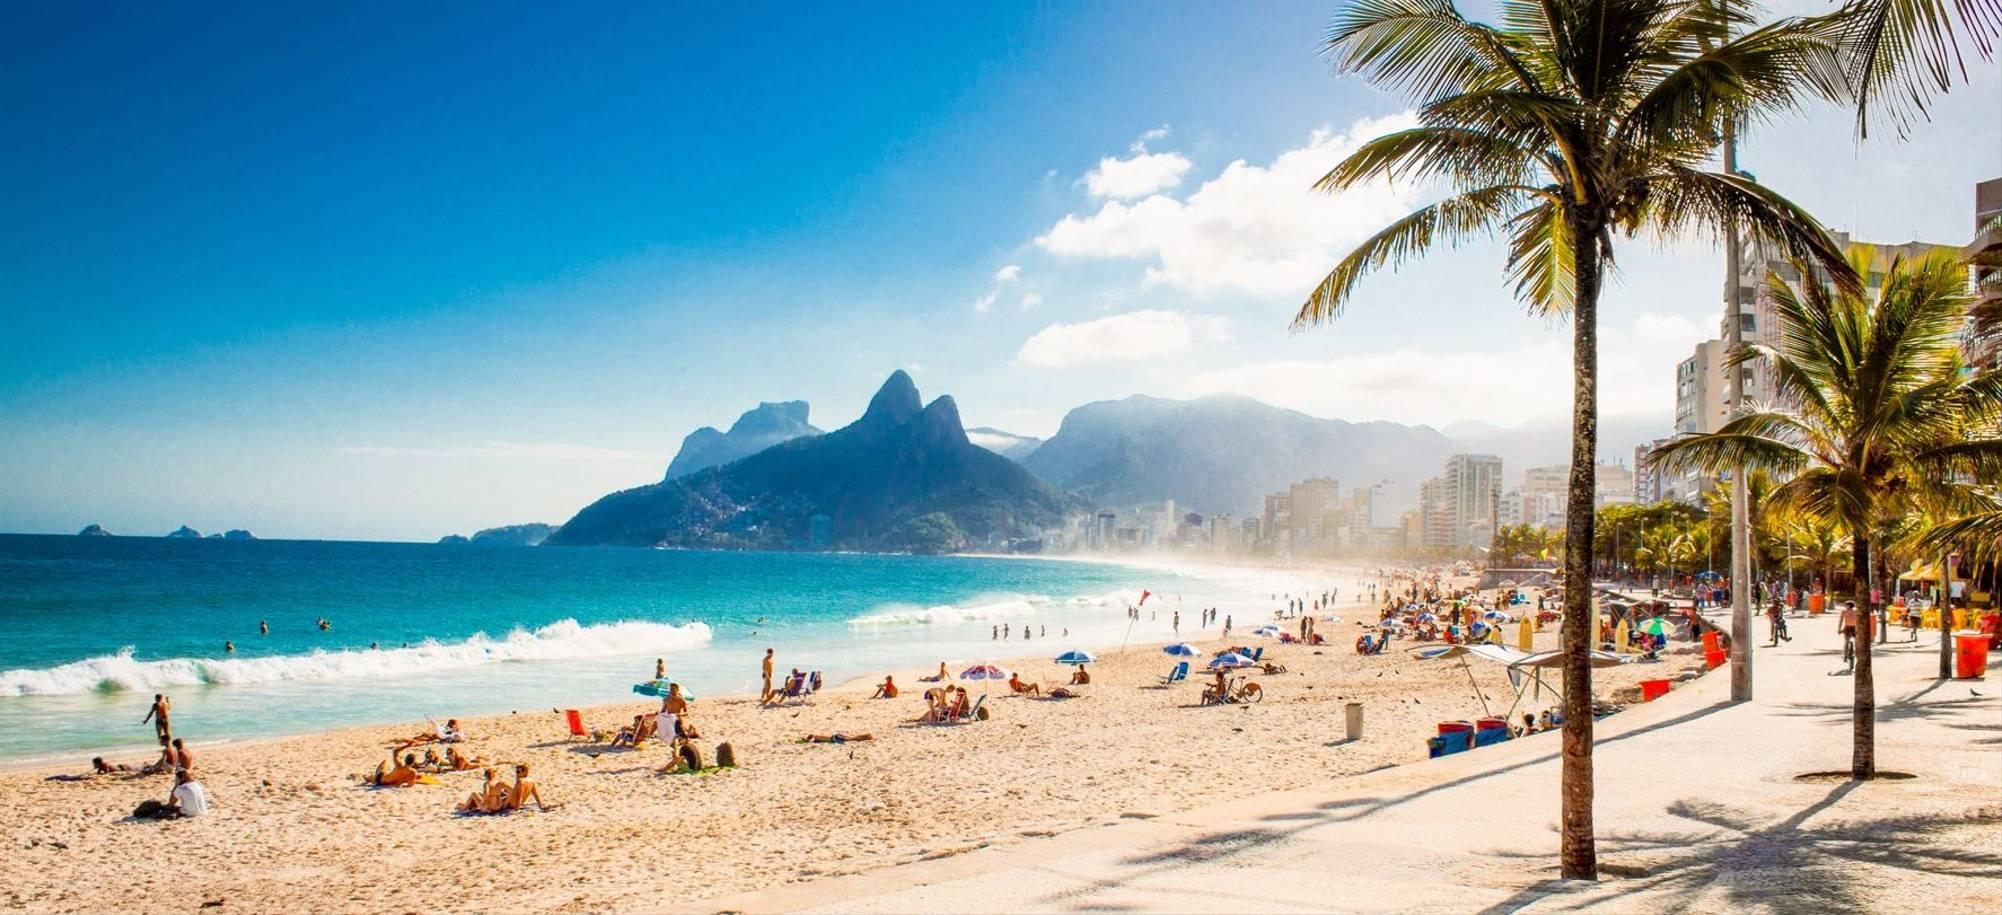 Rio   Itinerary Desktop